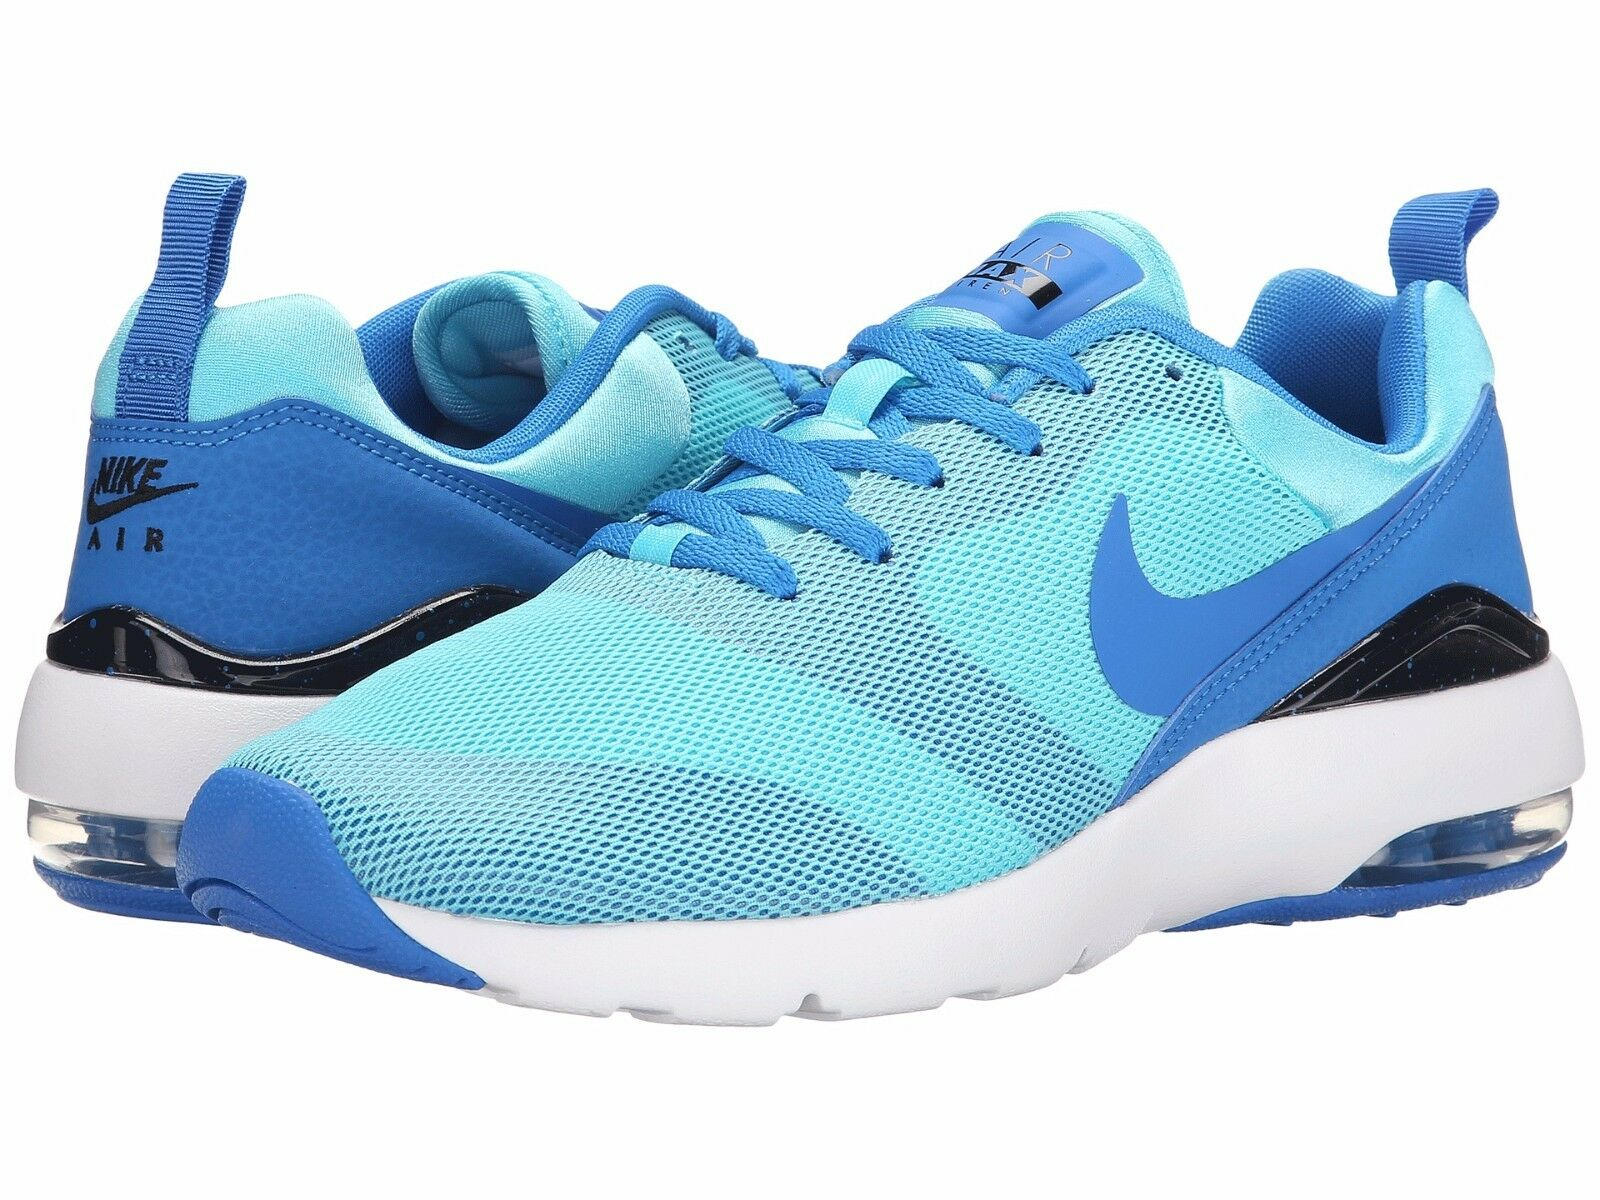 Para Mujer Nike Air Max Max Max Sirena Piscina Azul/Negro-blanco Tallas 6-10 Nuevo En Caja 94e23b